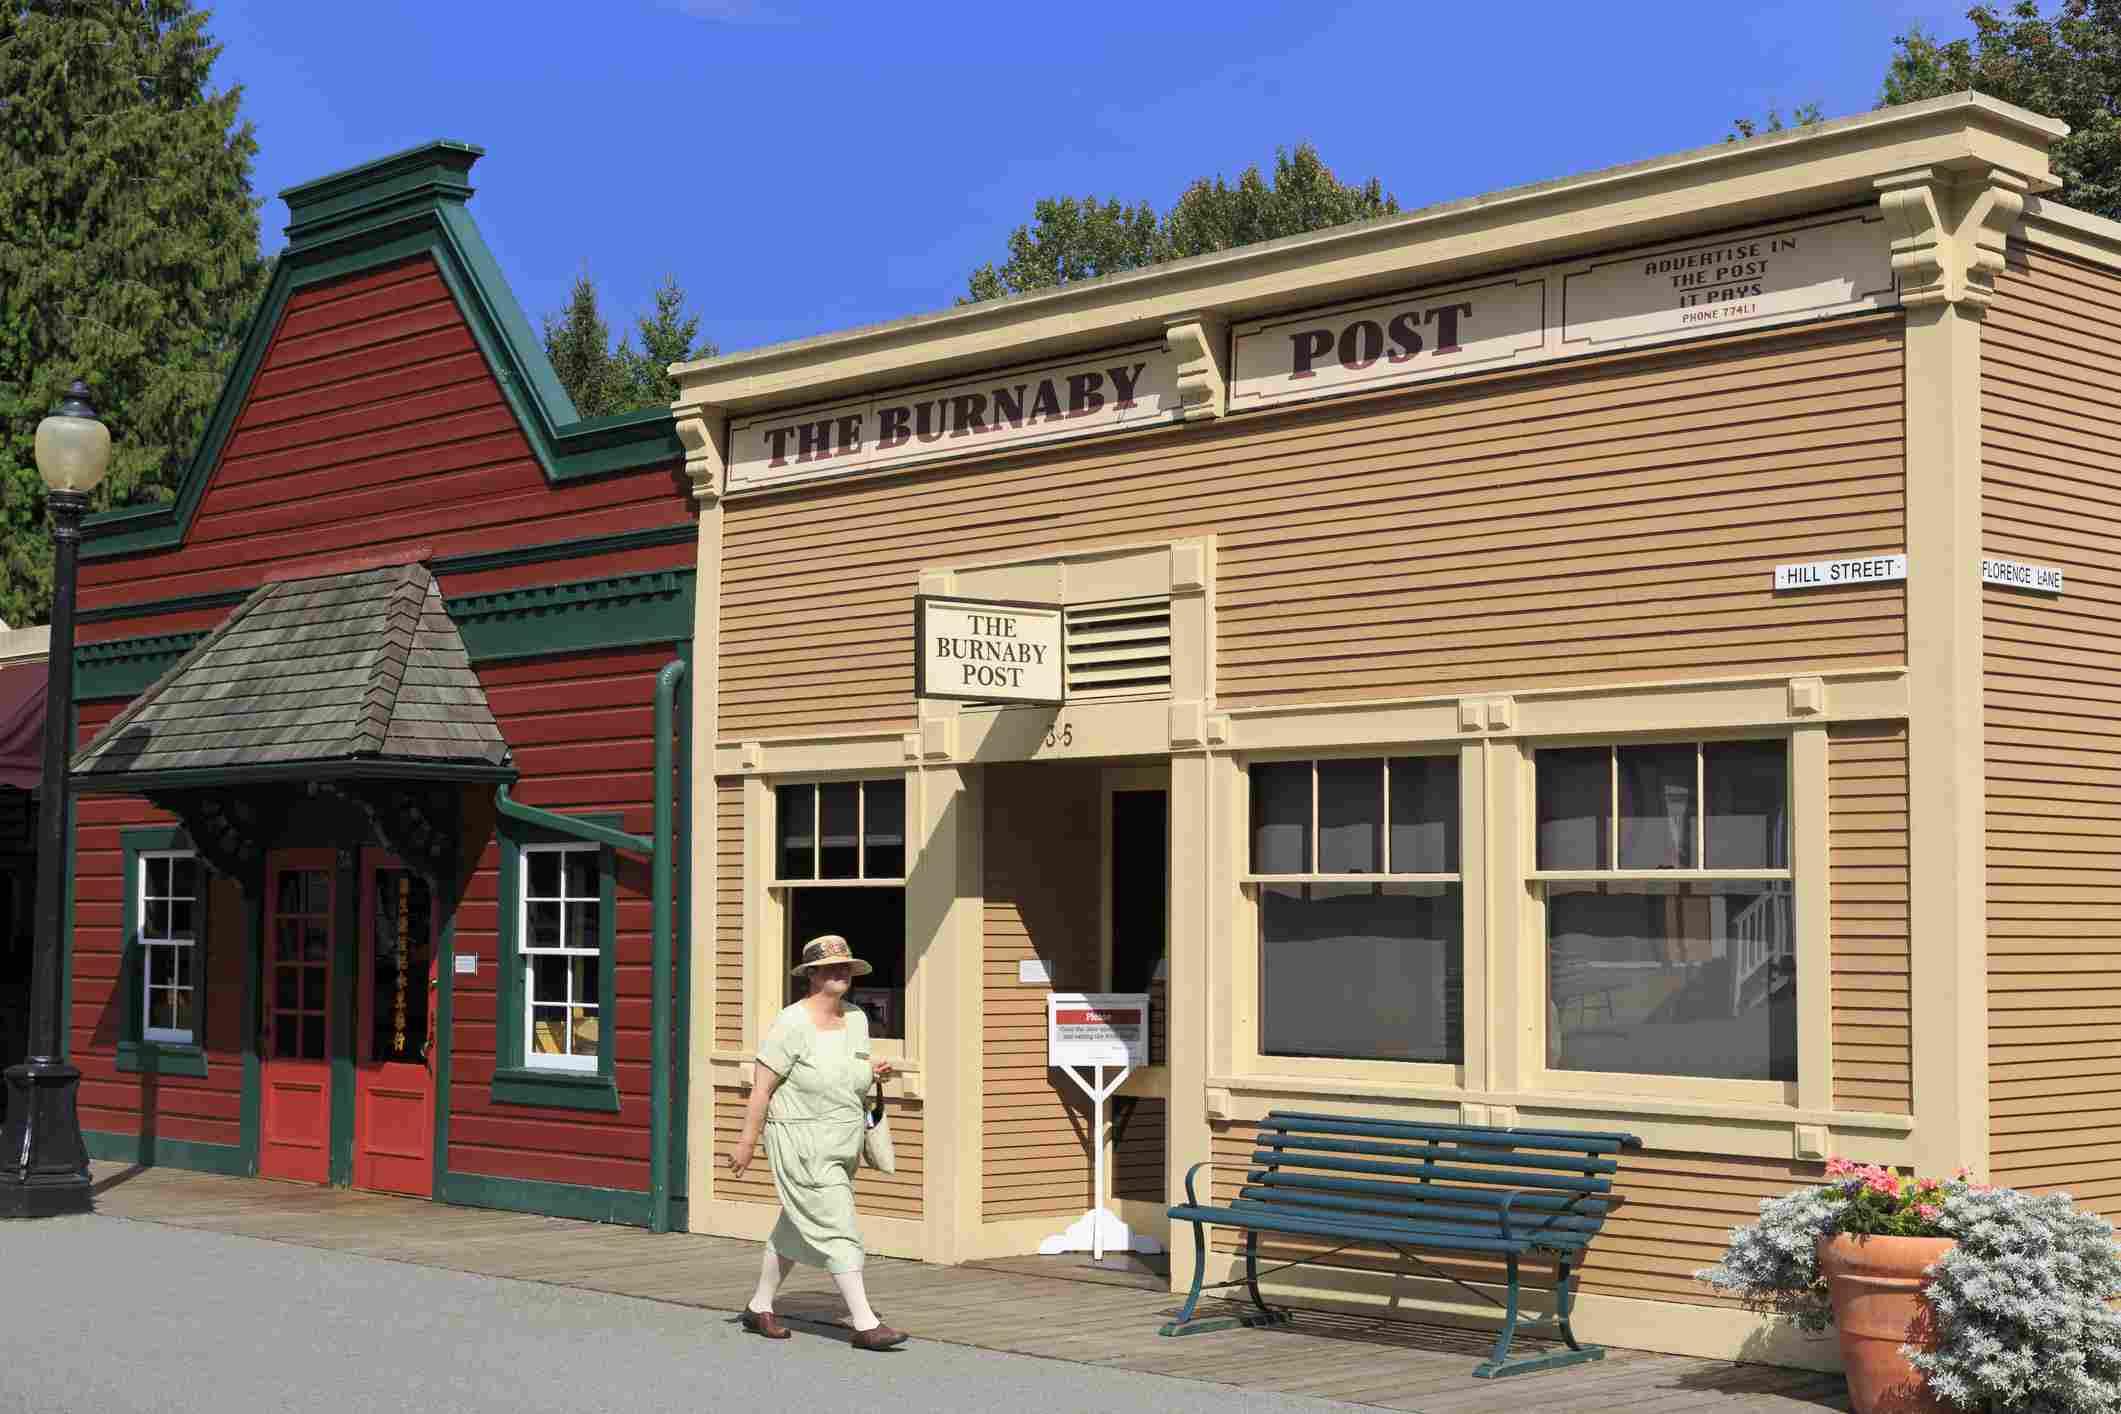 Historic village in BC